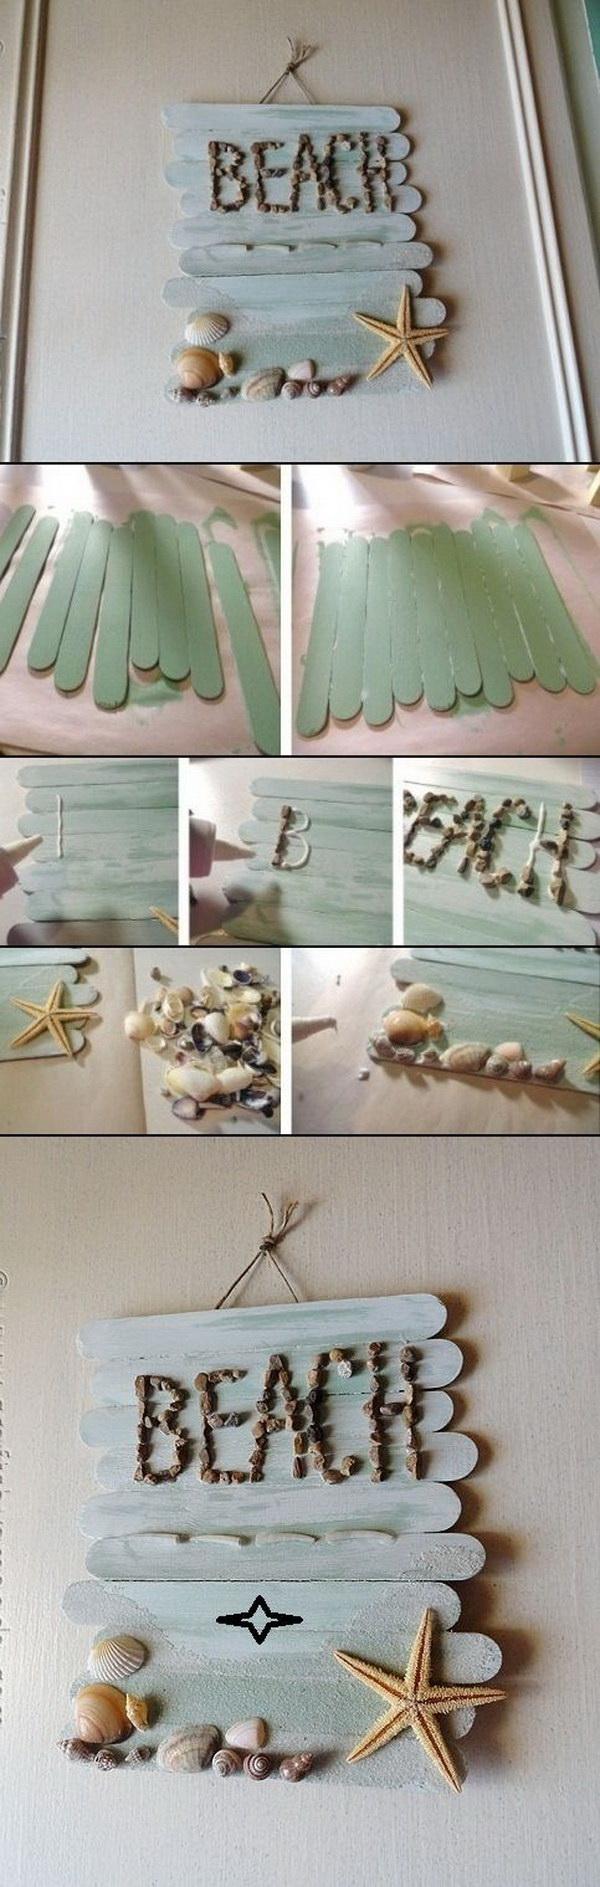 DIY Craft Stick Wall Art.